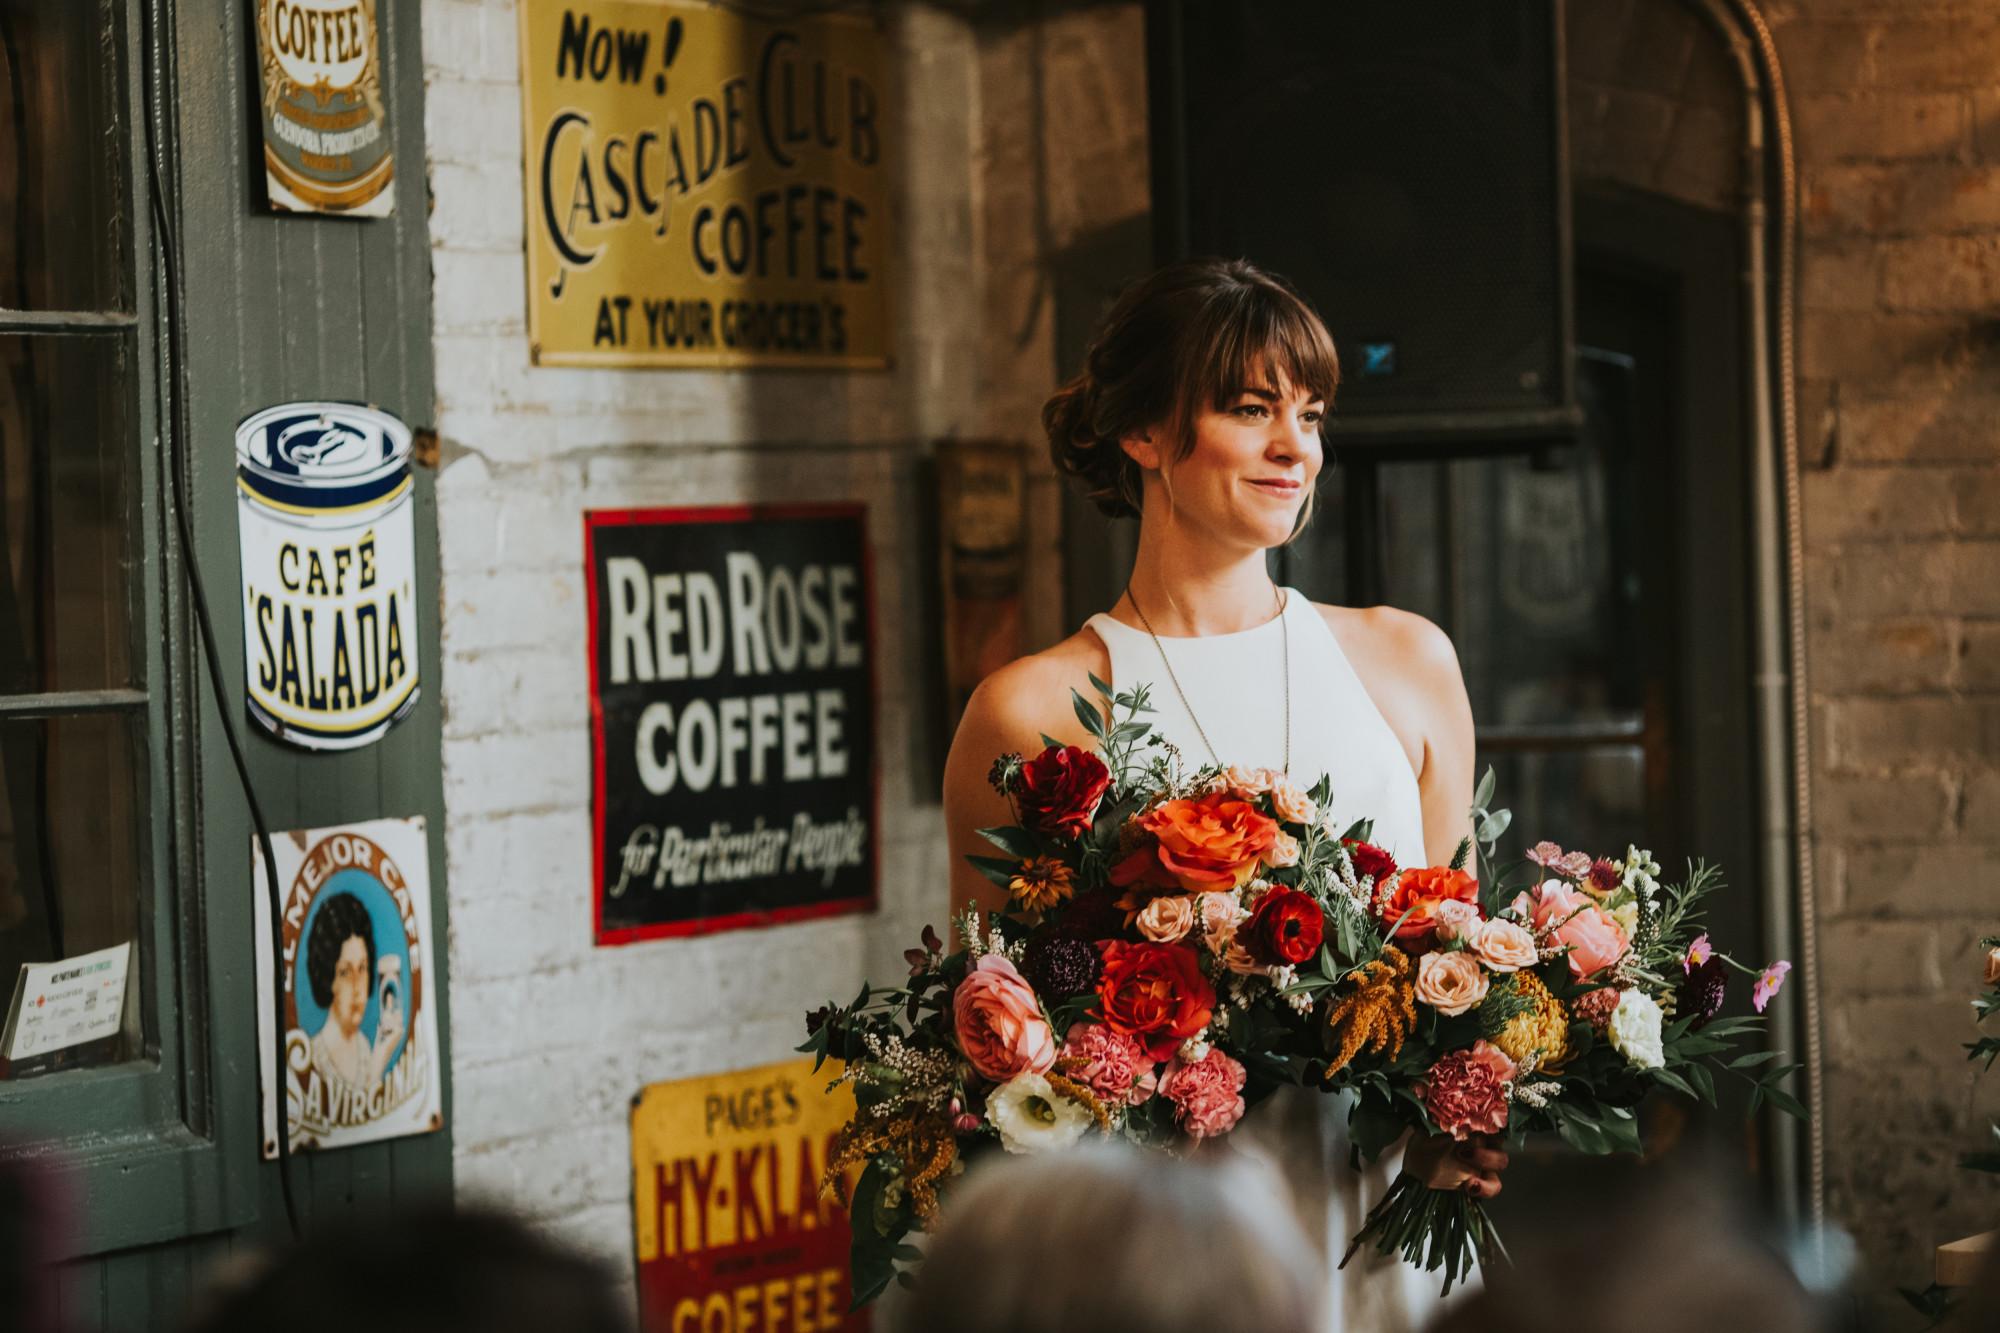 Beth-Ted-Balzacs-Coffee-Distillery-District-Toronto-Wedding-Planning-INLY-Events-Lushana-Bale-Photography-0172.jpg